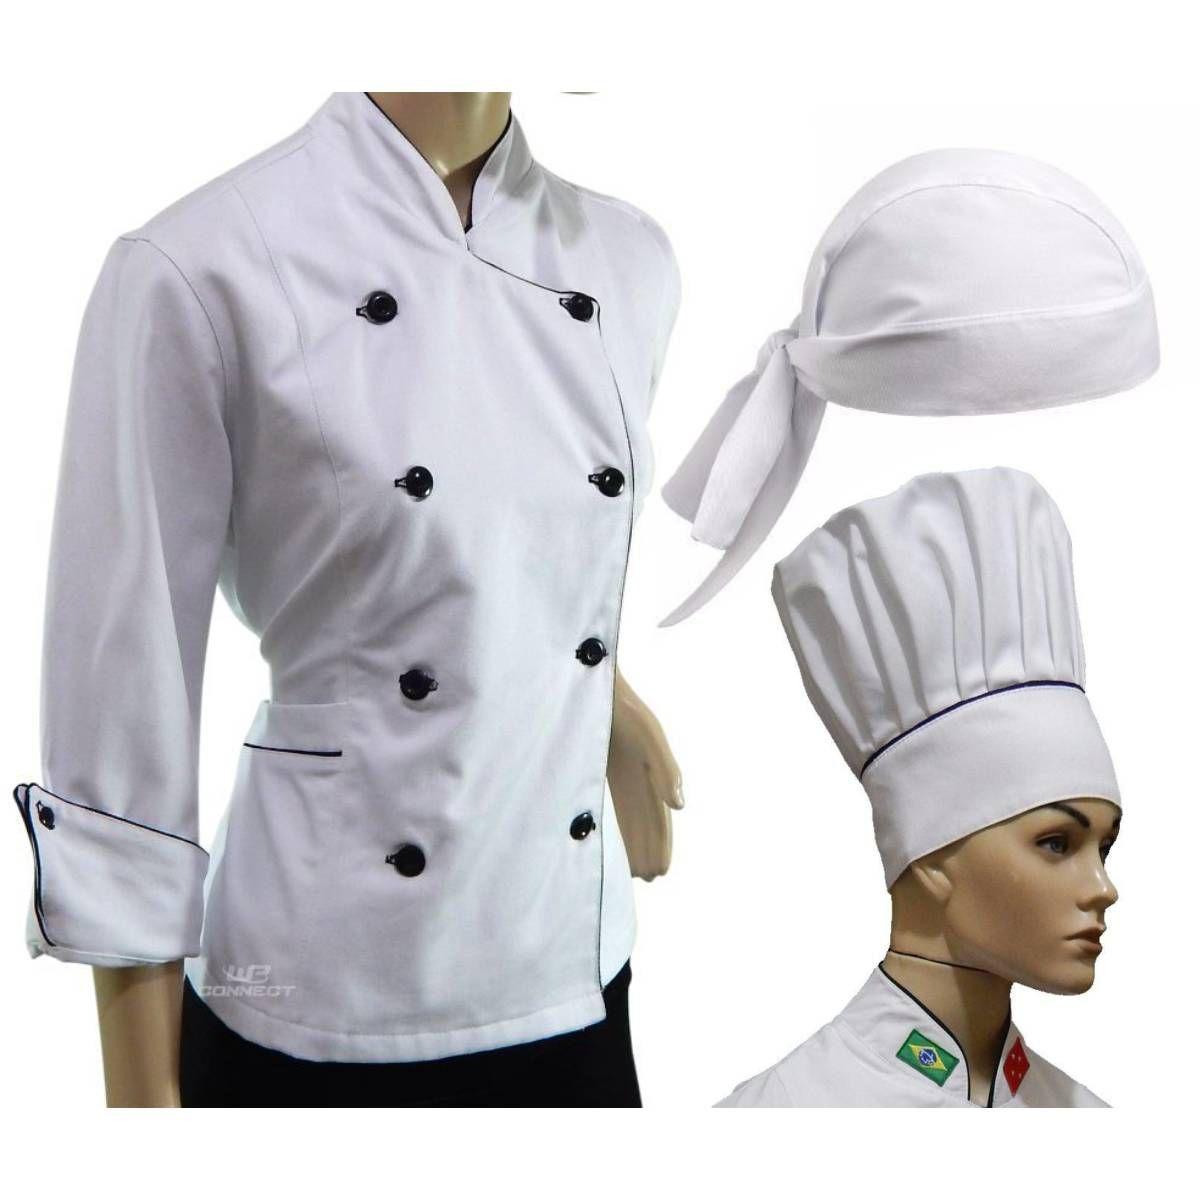 Conjunto Para Chef de Cozinha Feminino Dólmã Chapéu Bandana - WP Connect abefc3d5d7b